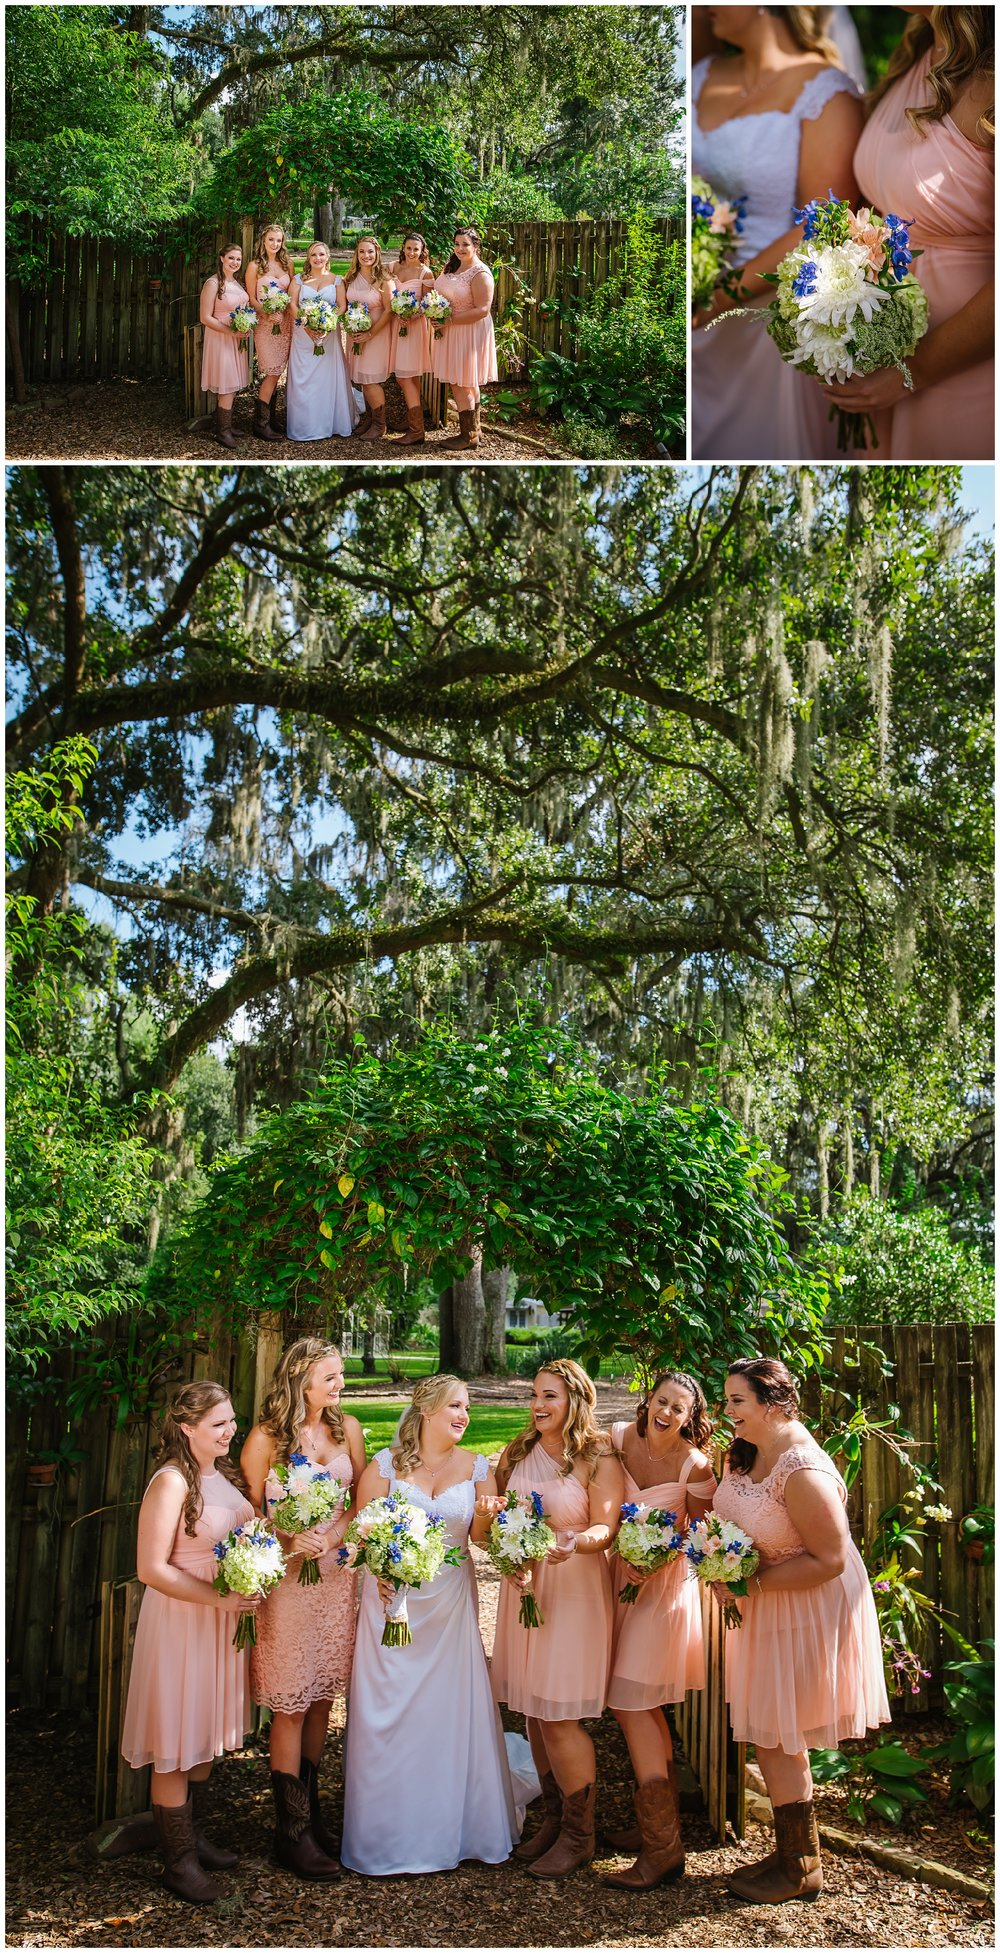 Cross-creek-ranch-navy-bush-tampa-wedding-photogrpaher_0010.jpg